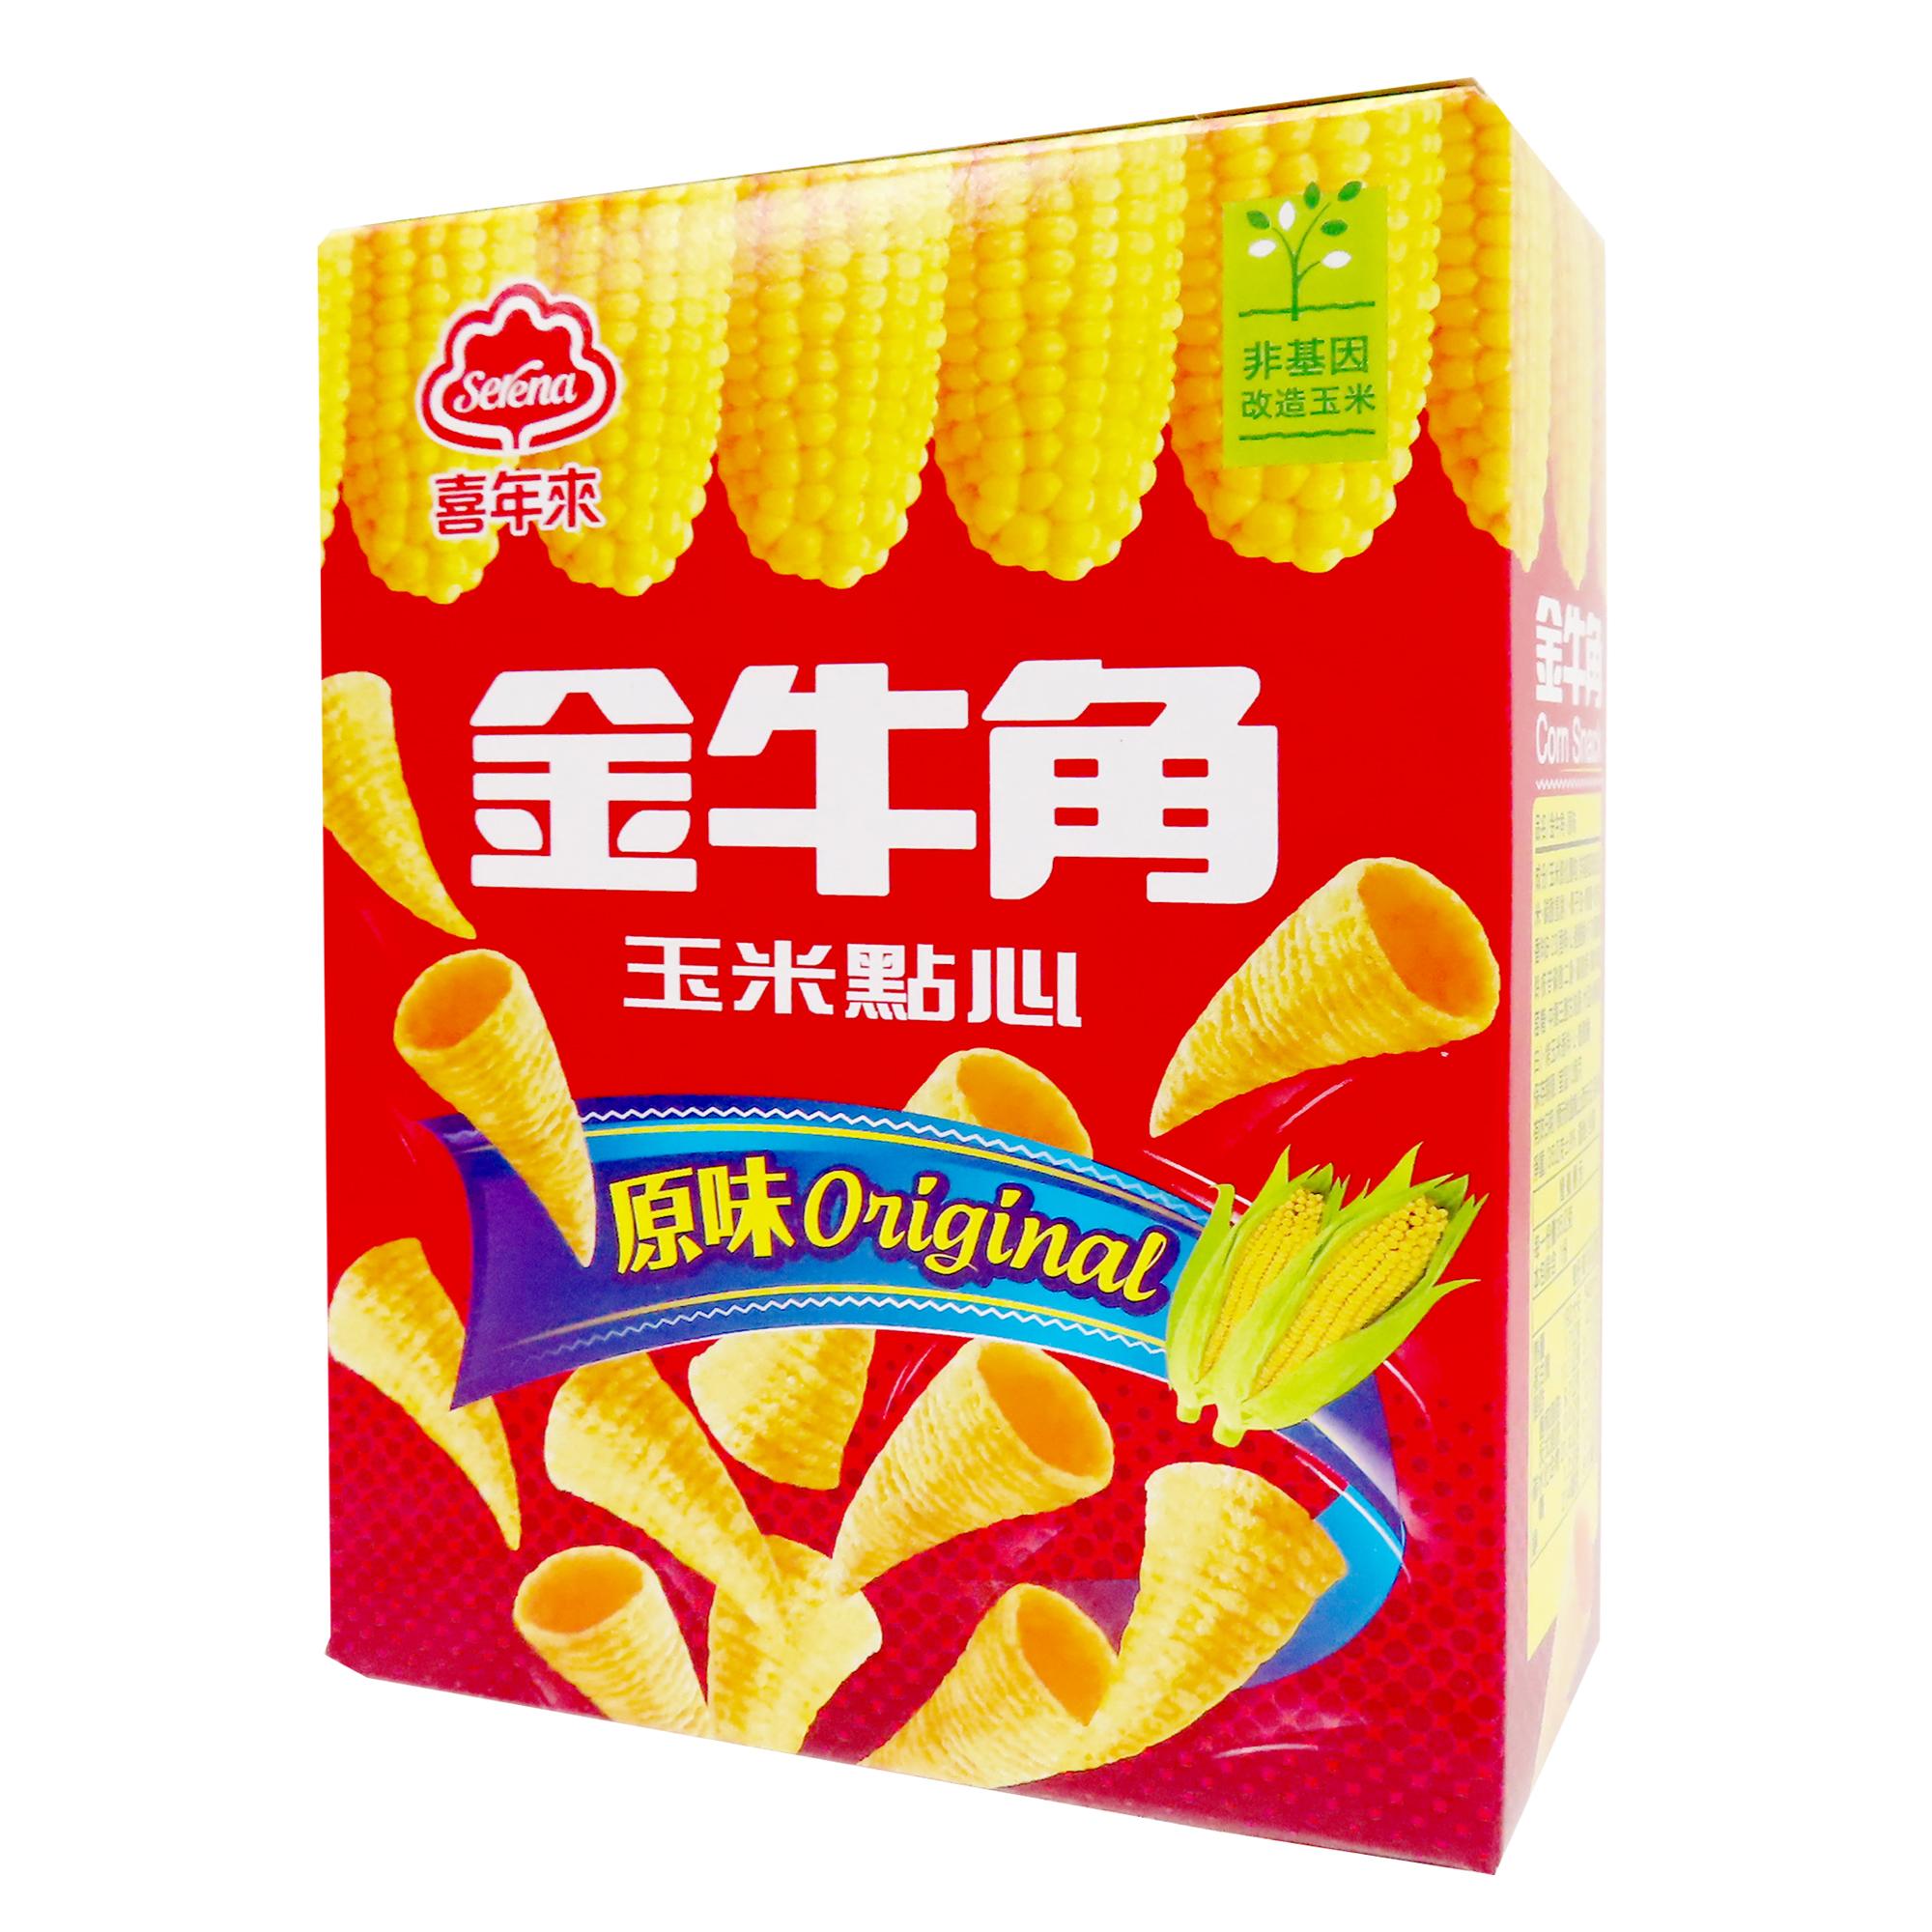 Image Vegetarian American Corn Snack 喜年来-金牛角 35grams